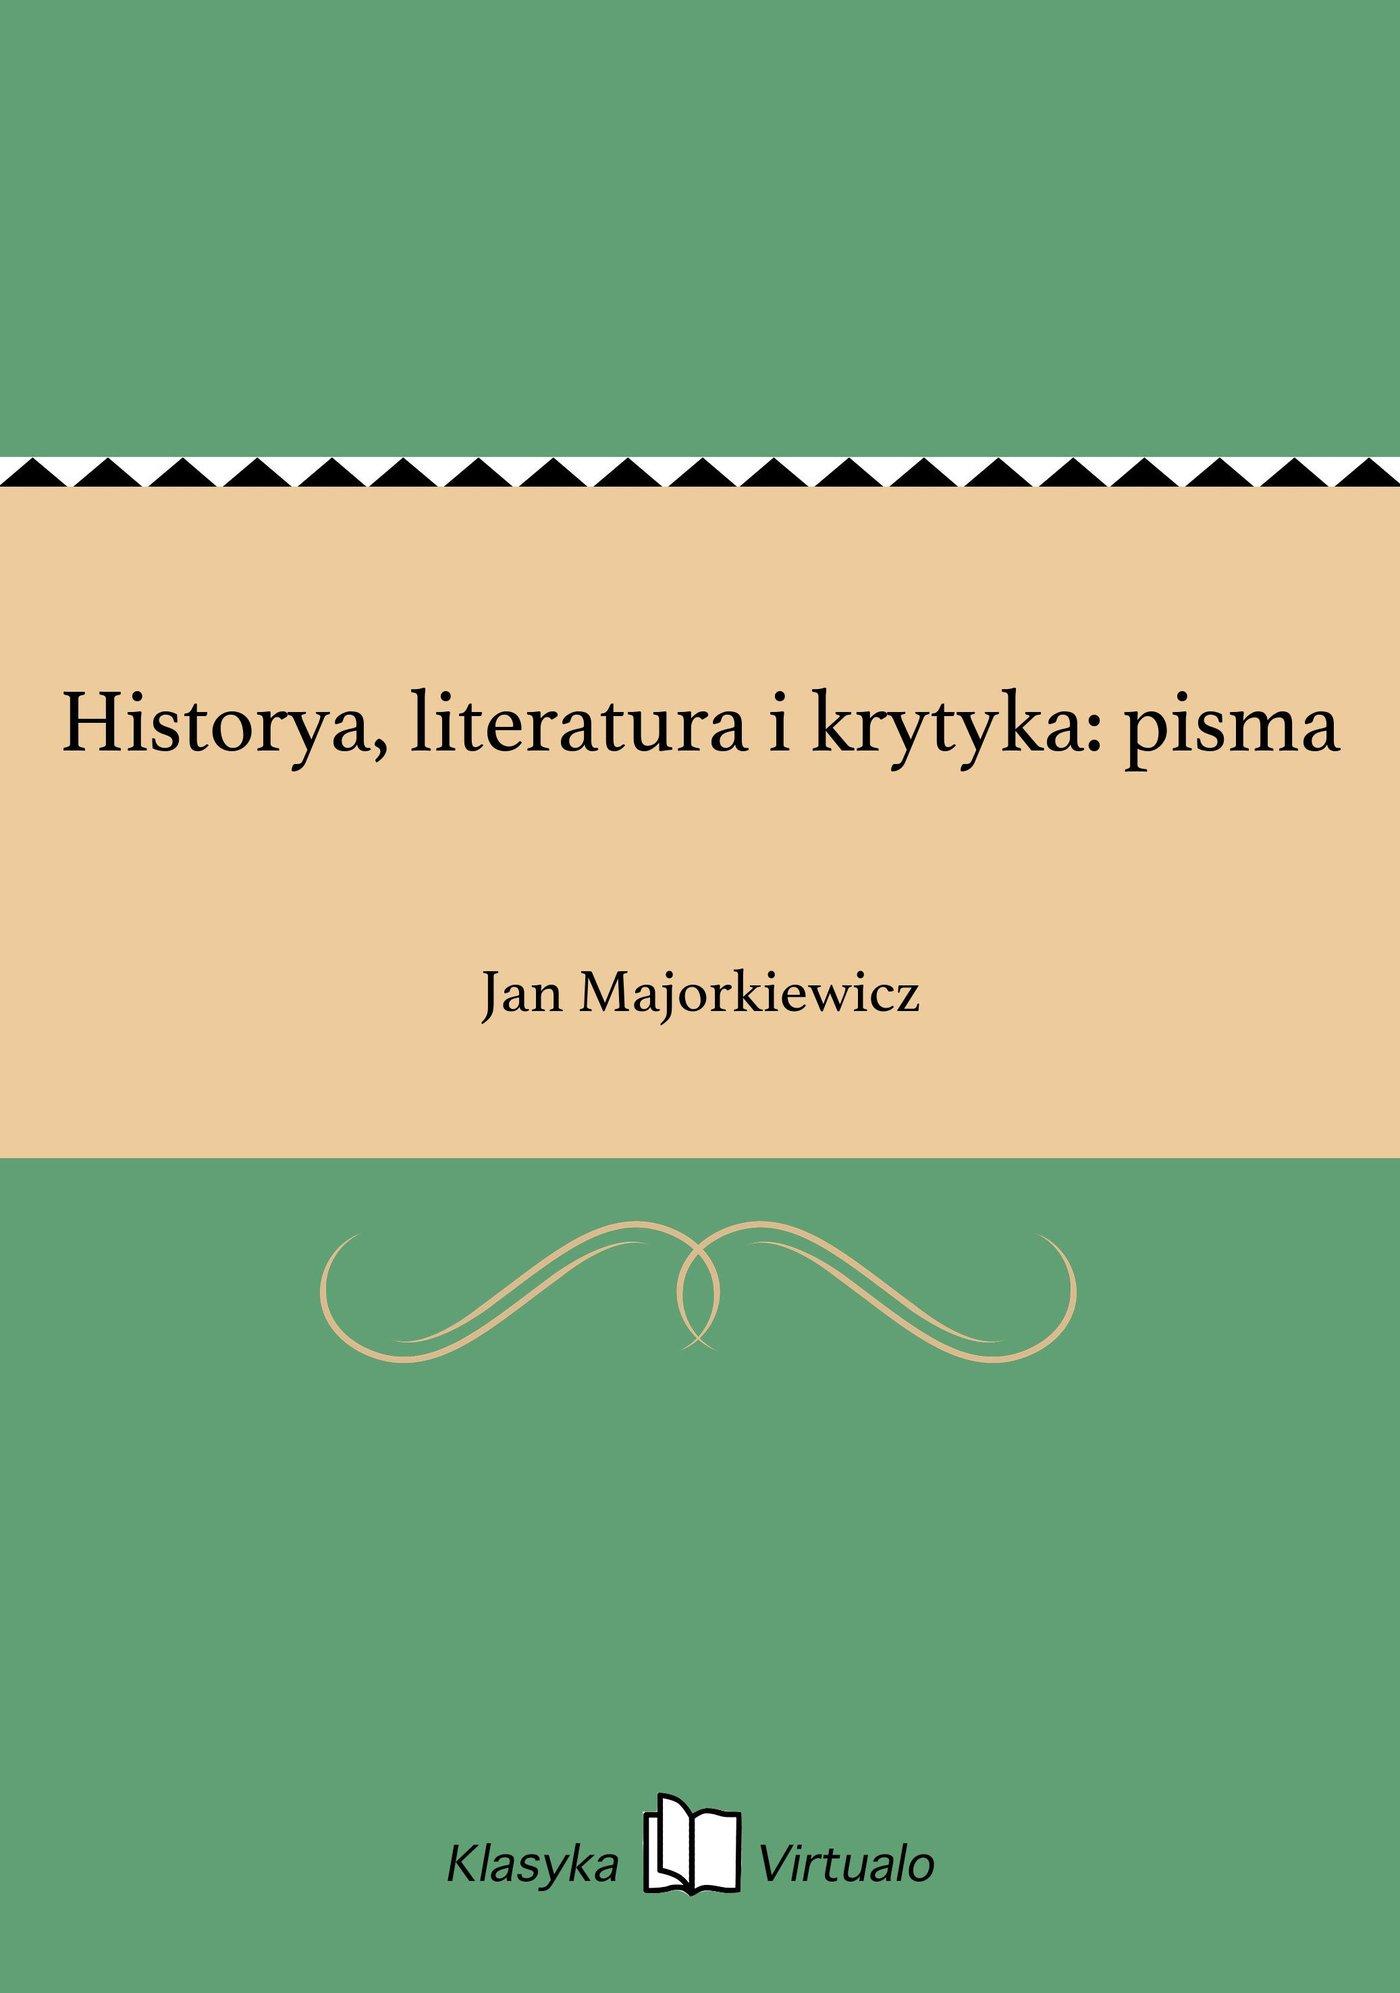 Historya, literatura i krytyka: pisma - Ebook (Książka EPUB) do pobrania w formacie EPUB